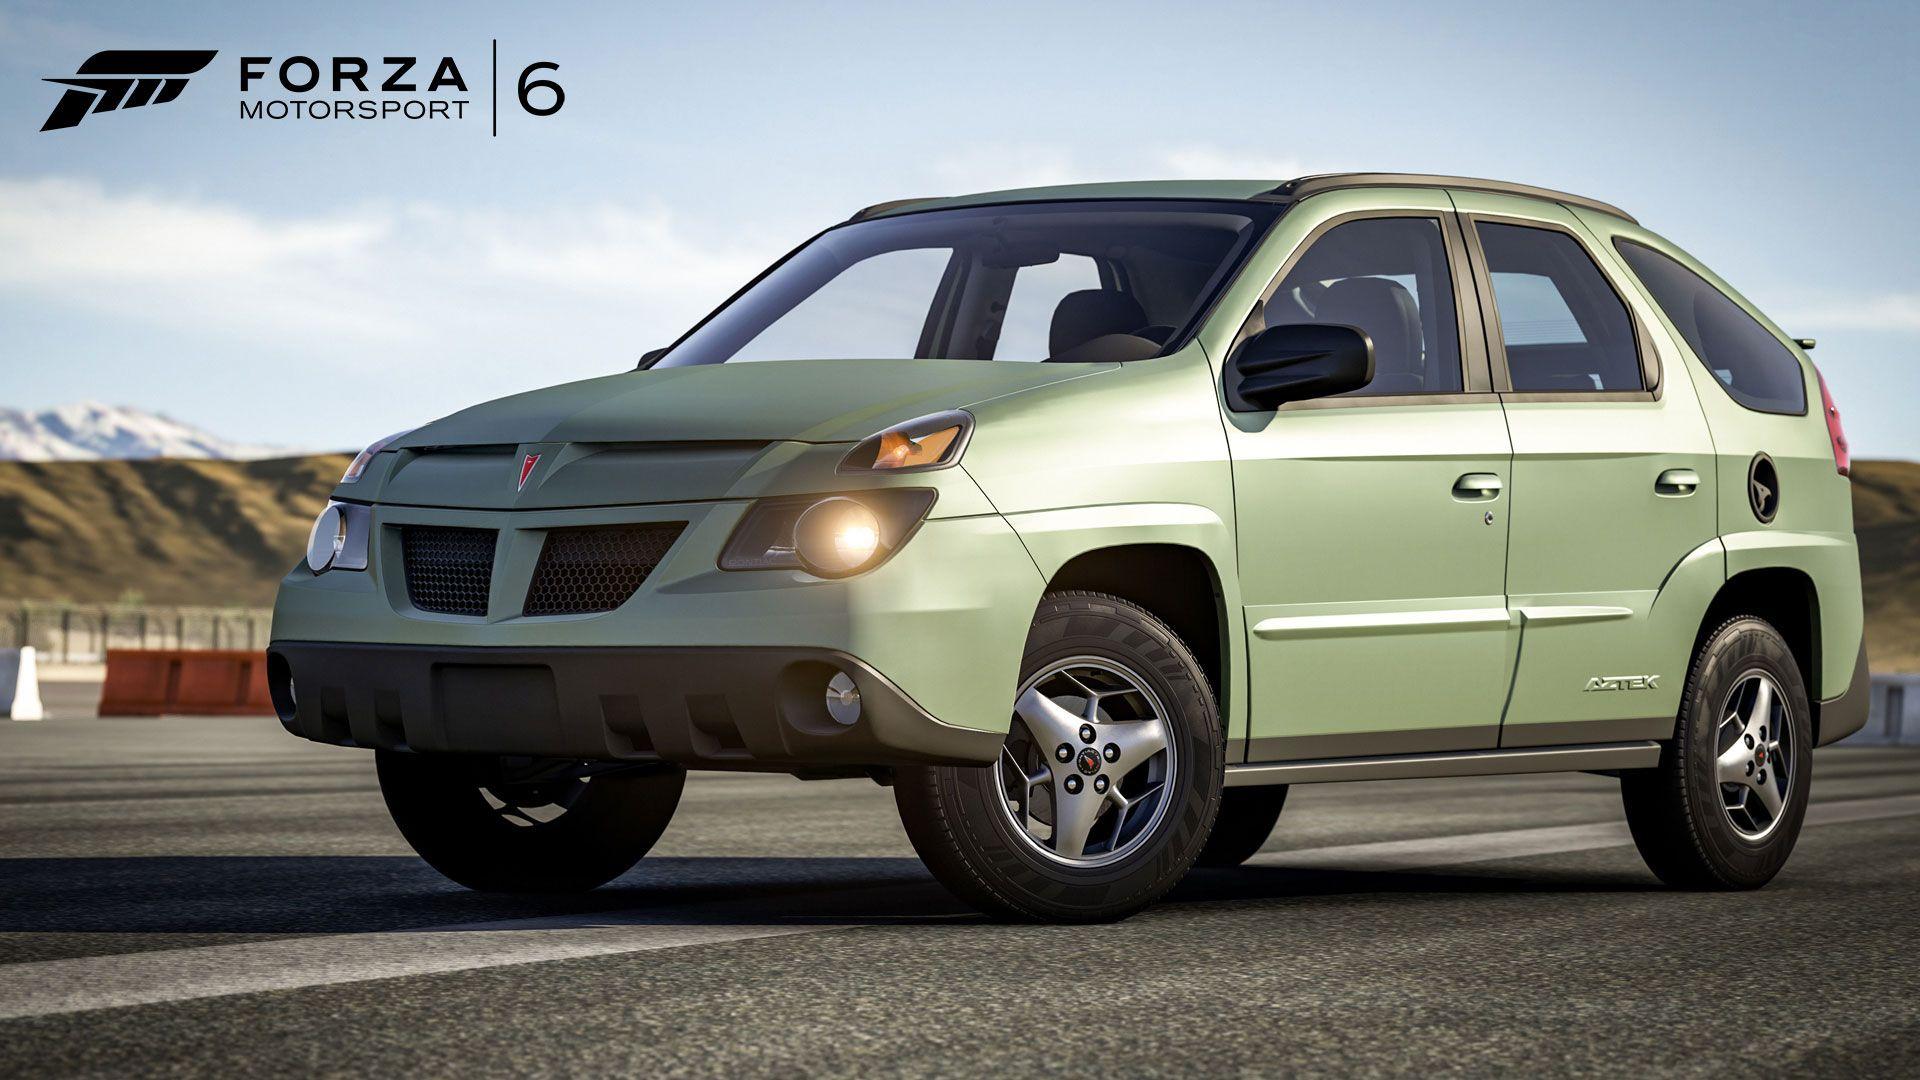 New forza 6 car pack includes a pontiac aztek the drive